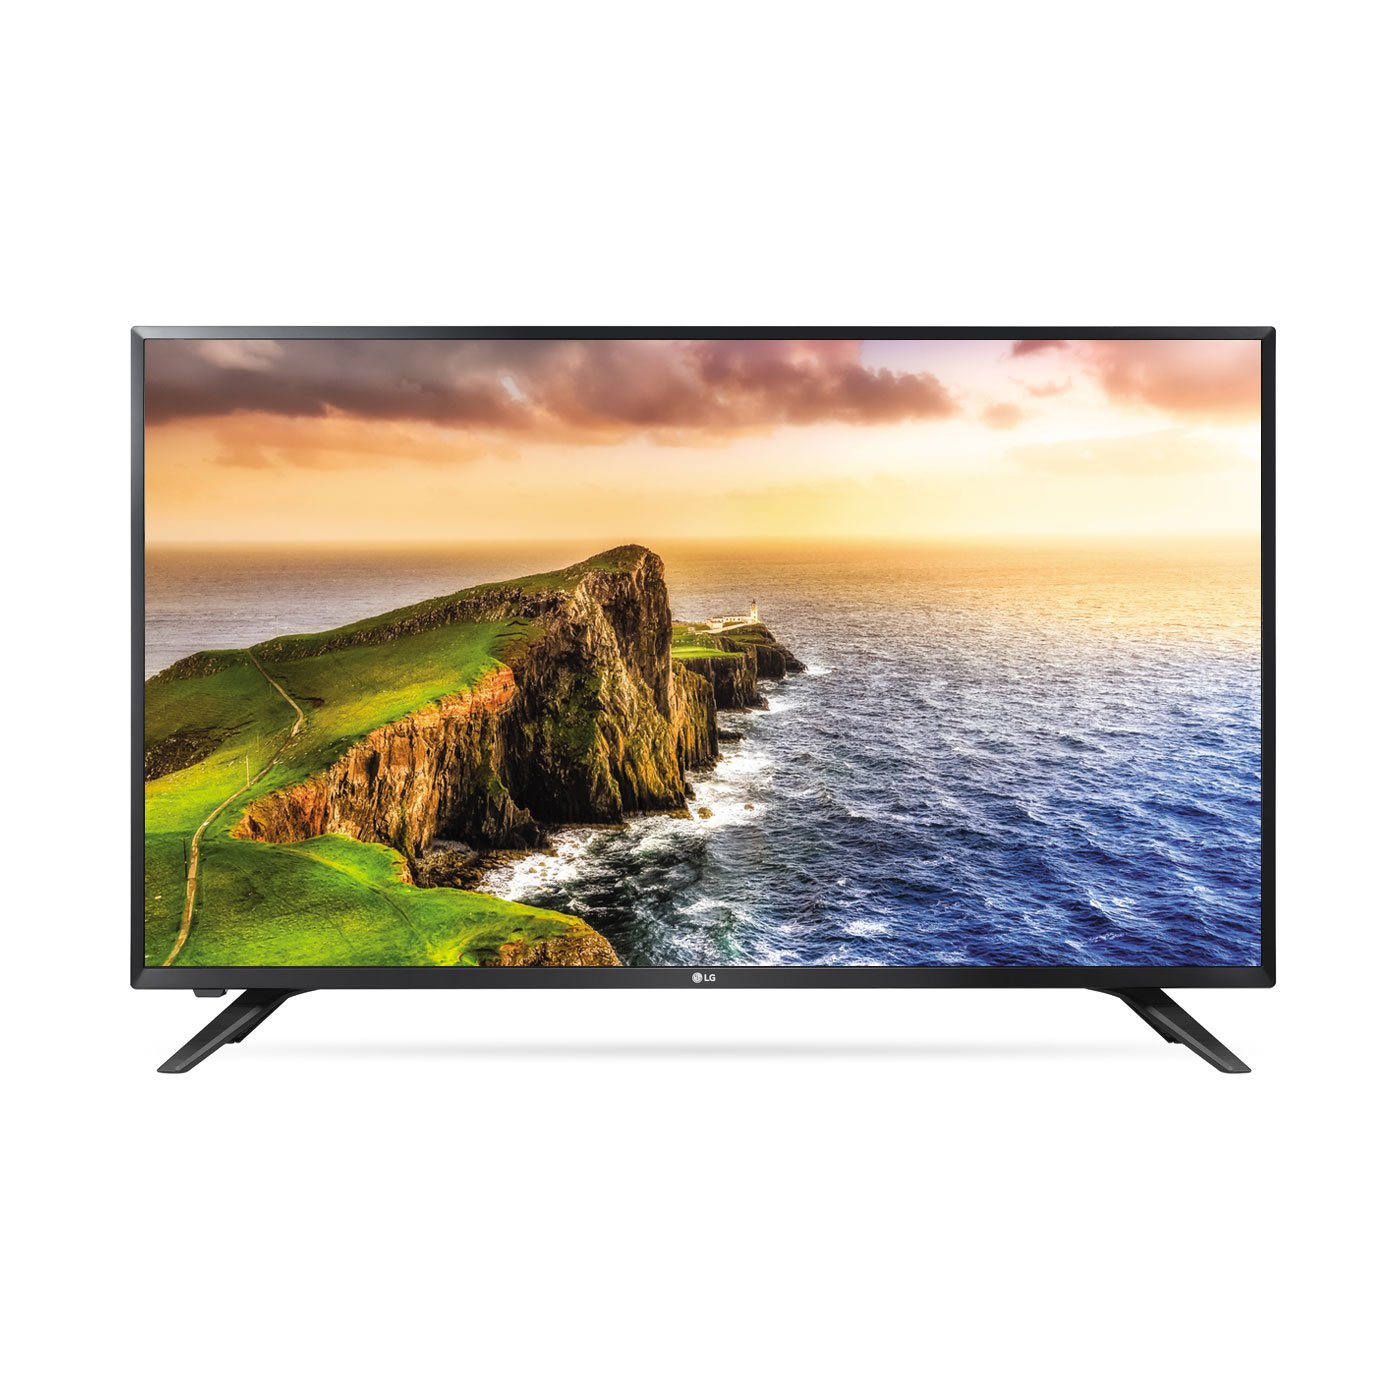 Televisor LG 43LV300C - LED Full HD de 43 pulgadas (109 cm) 16/9 ...